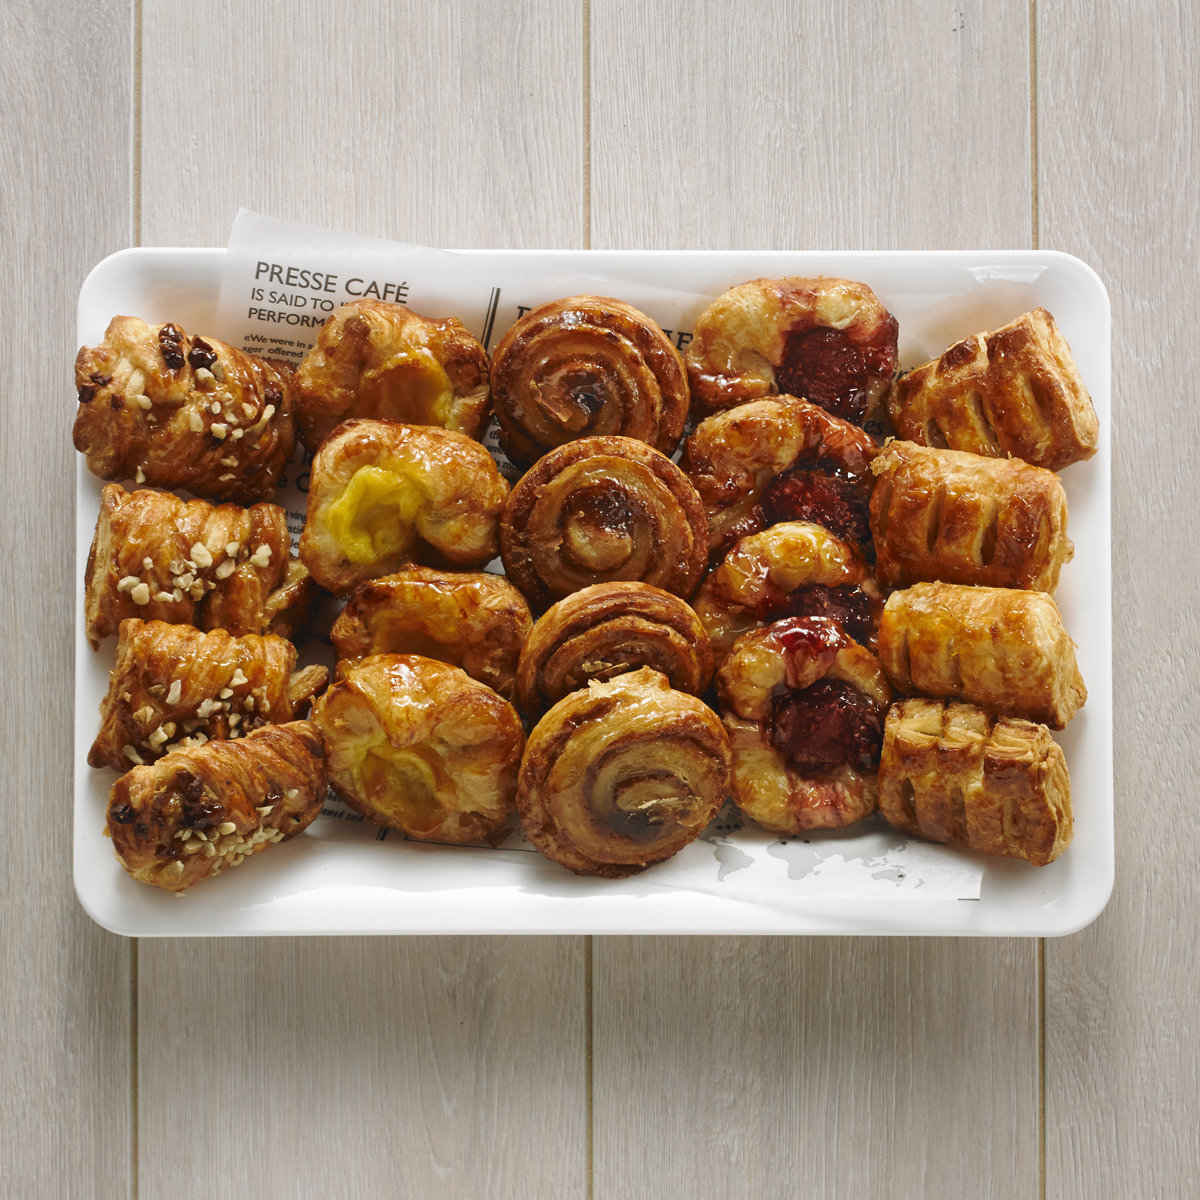 Mini Pastry Platter